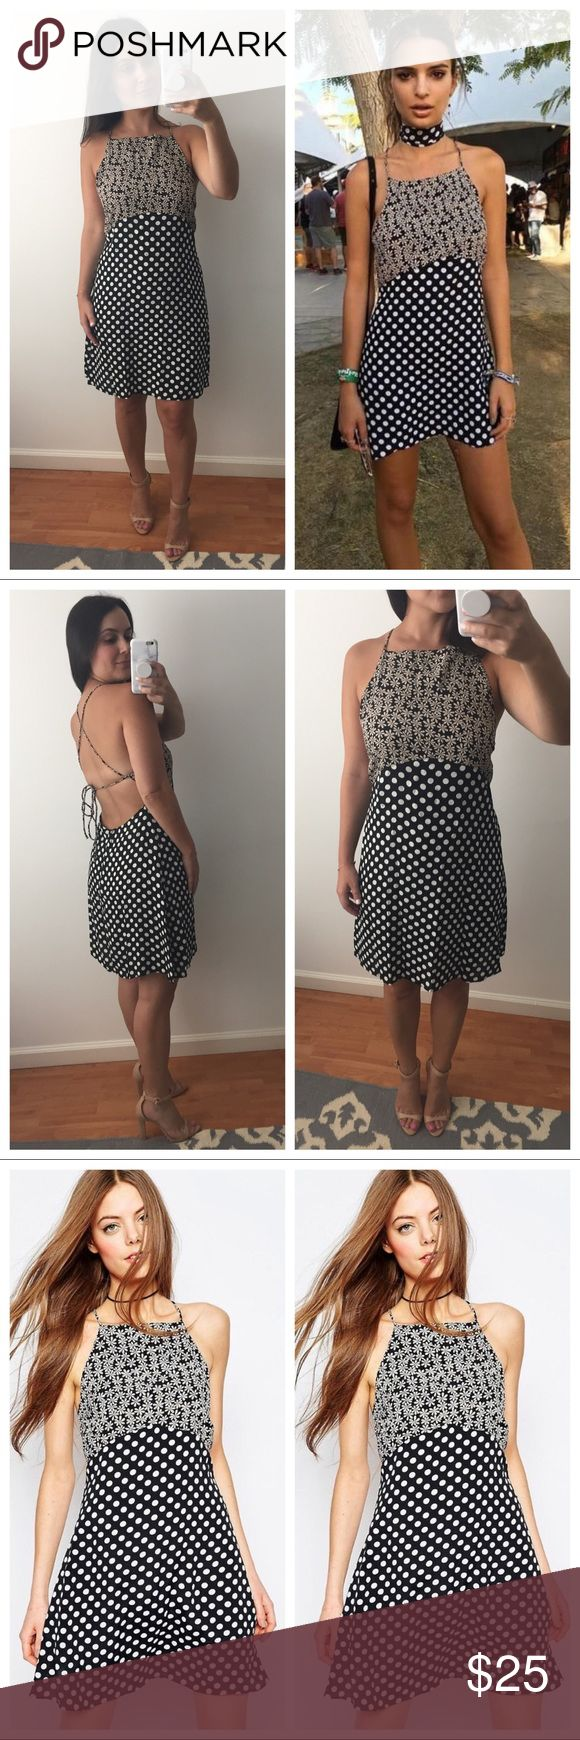 NWOT ASOS Petite Mix Print Tie Back Dress Never worn! NWOT ASOS Petite Mix Print Tie Back Dress as seen on Emily Ratajkowski.  US 8, fits like a medium. No trades, no PayPal, price firm. ASOS Petite Dresses Mini